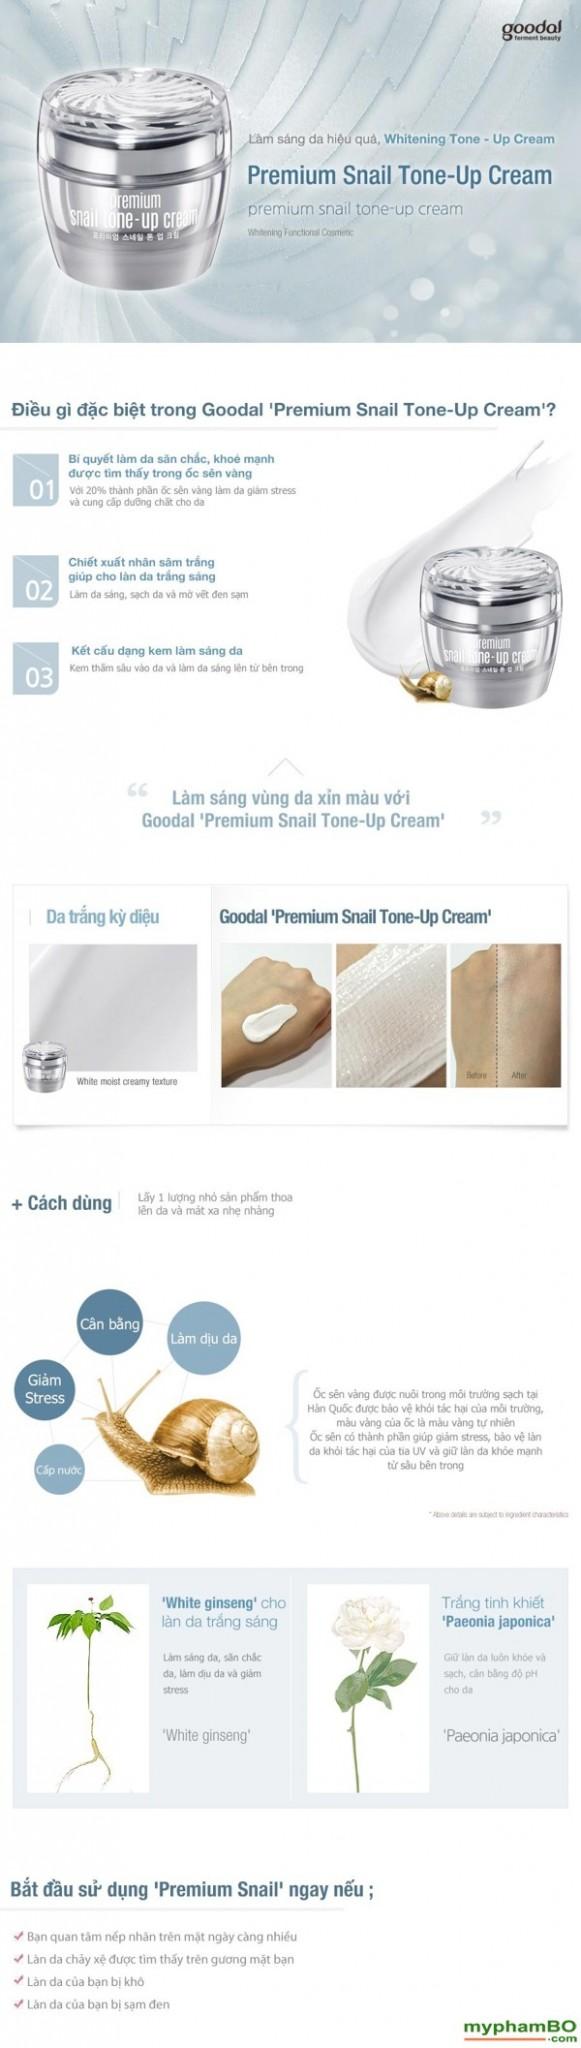 Kem Duong Da Cao Cap Oc Sen Goodal Premium Snail Tone Up Cream (1)